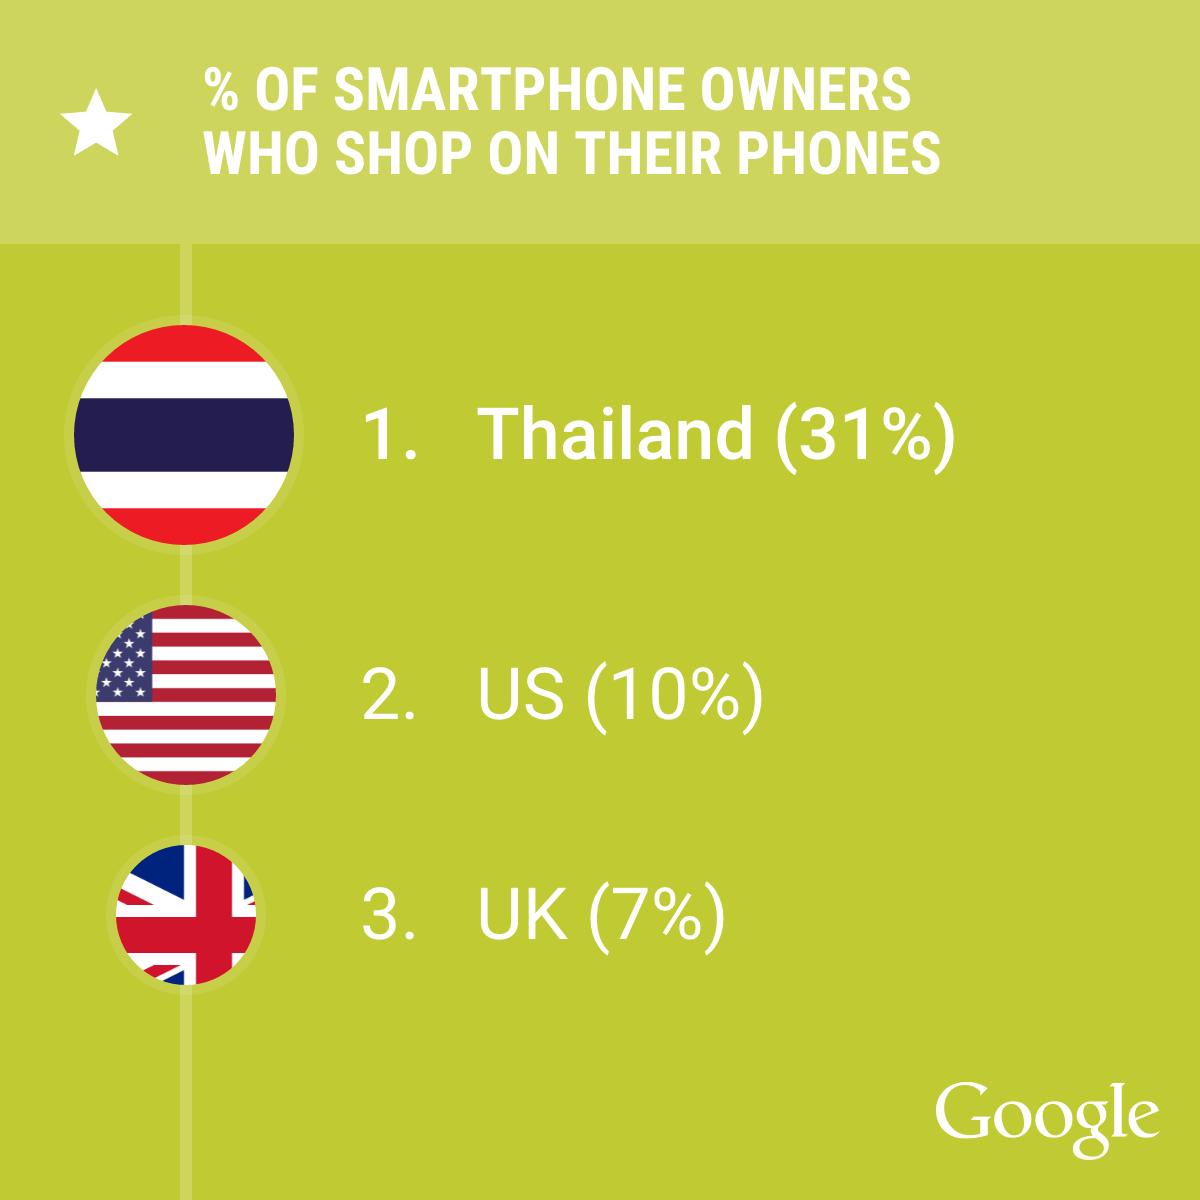 google-infographic (12).jpg